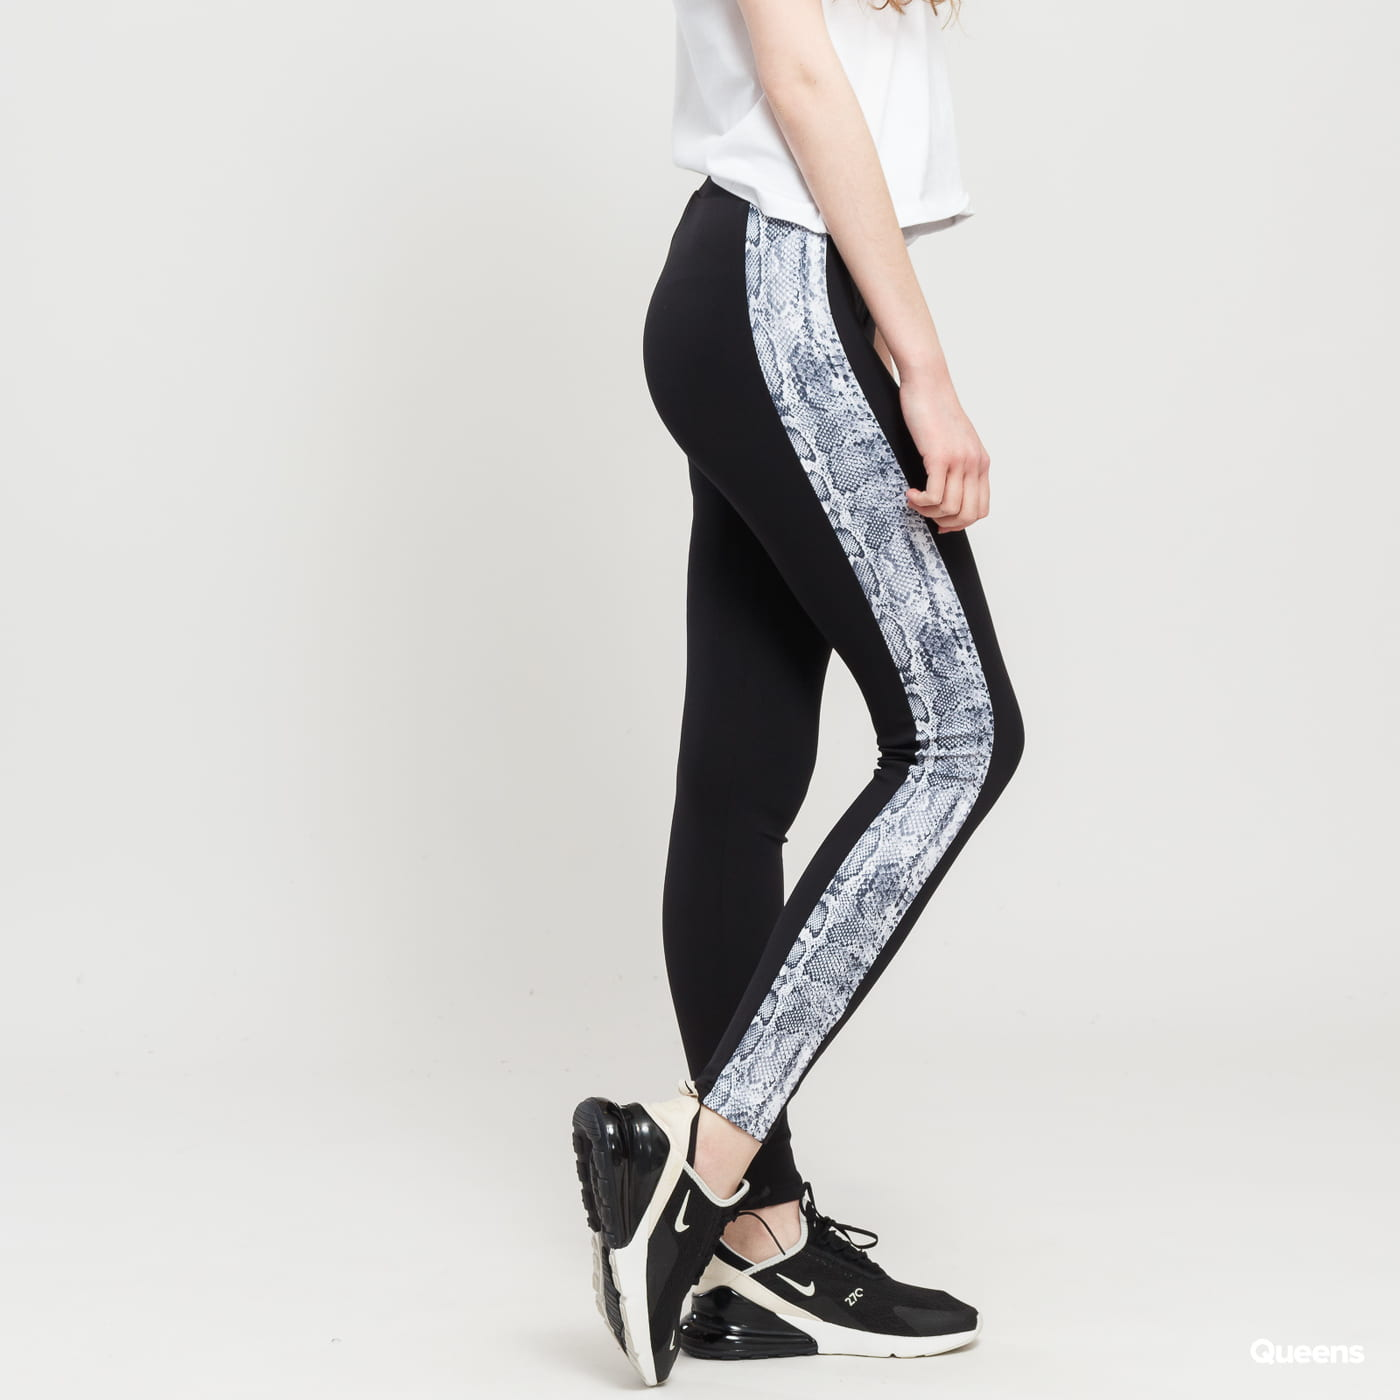 Urban Classics Ladies Side Striped Pattern Leggings čierne / šedé / biele